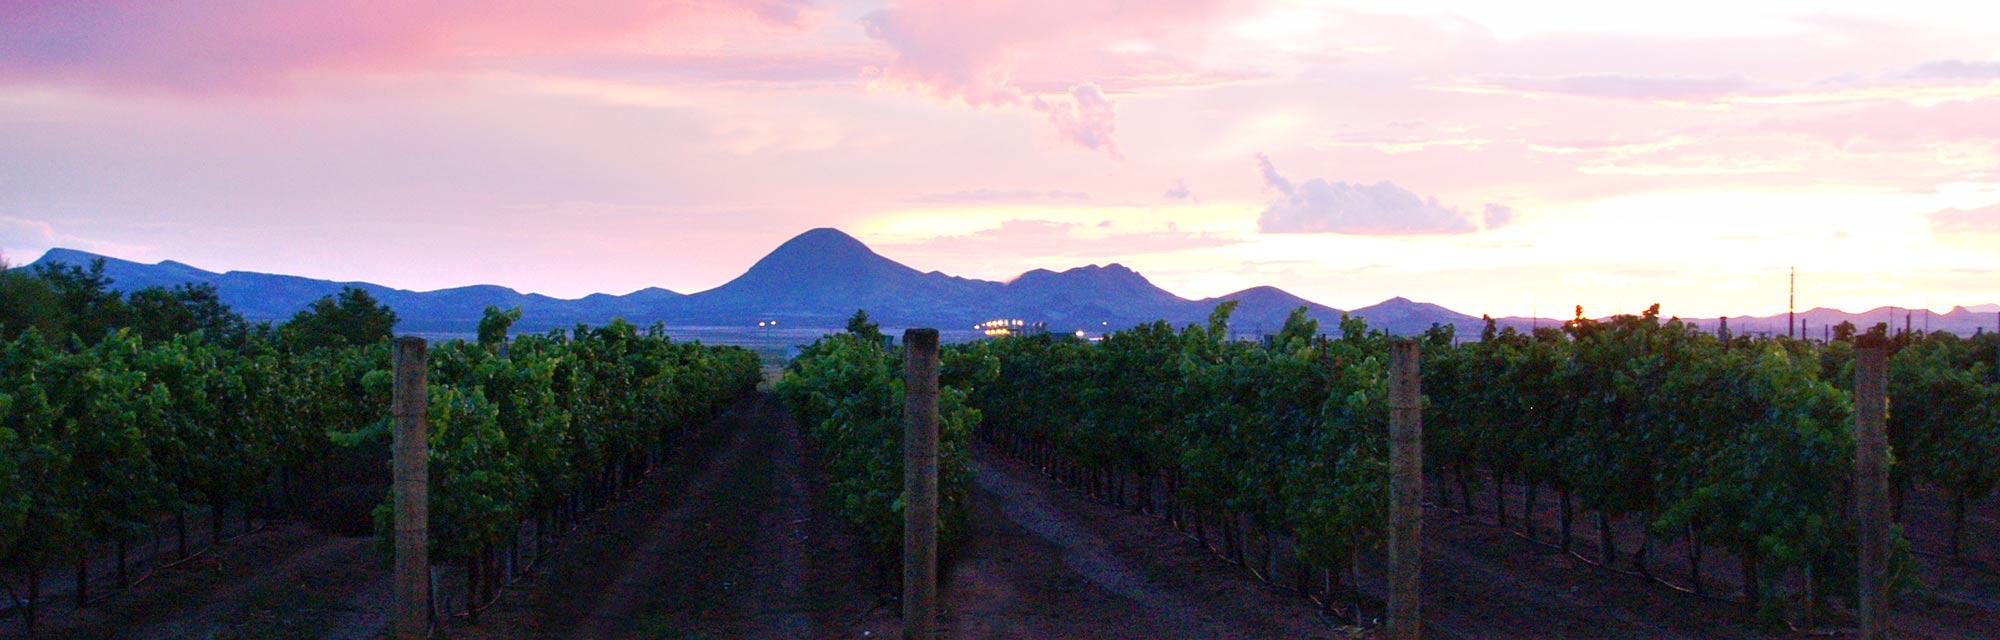 Vineyard at Sunset - Lescombes Family Vineyards